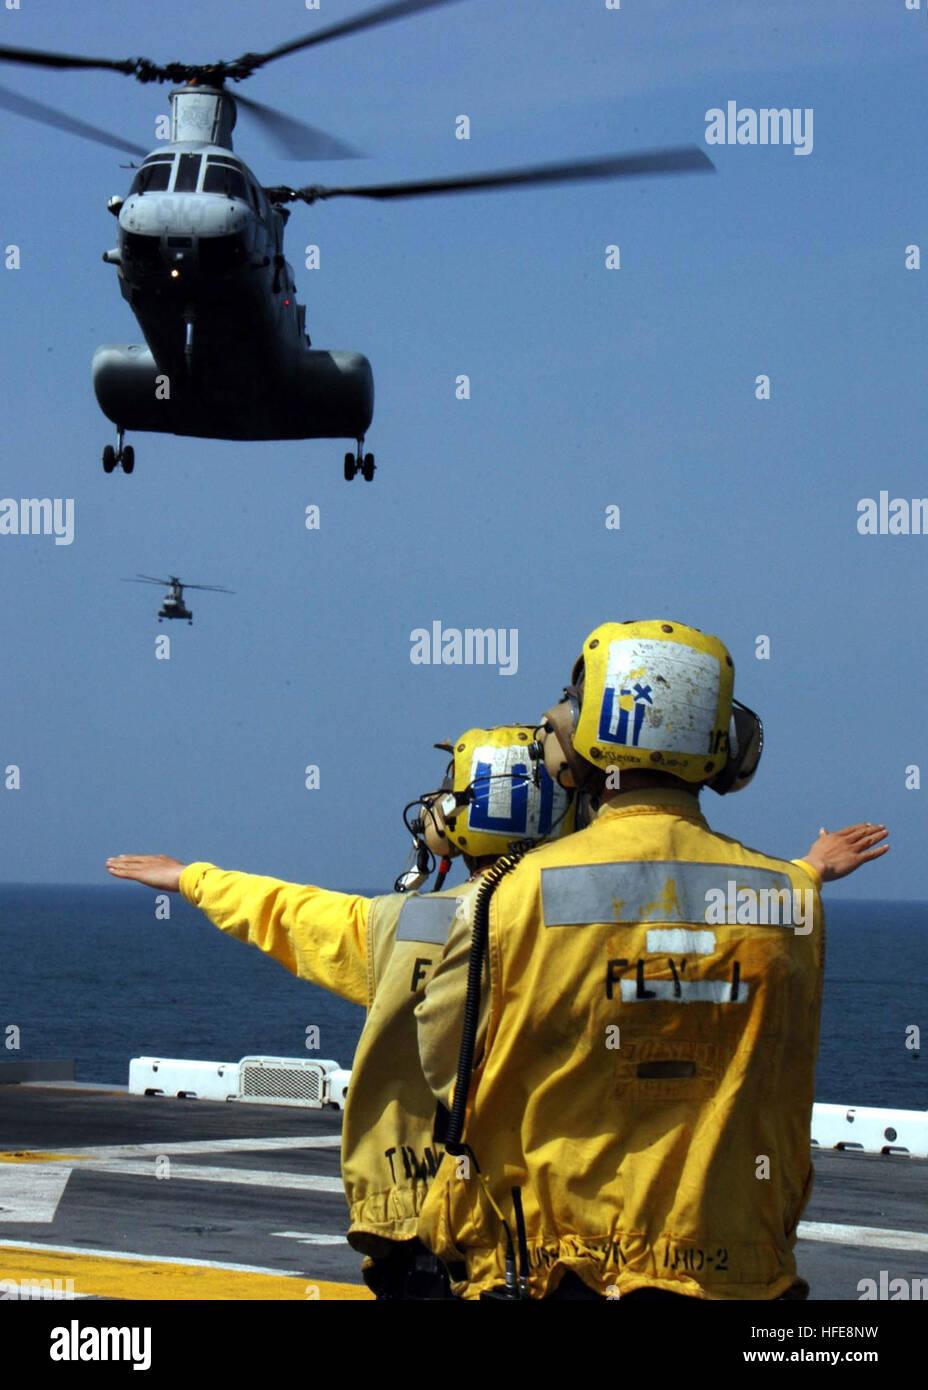 050121-N-8801B-003 Straits of Malacca (Jan. 21, 2005) - Aviation Boatswain's Mate Airman Allen M. Cameron, foreground, - Stock Image